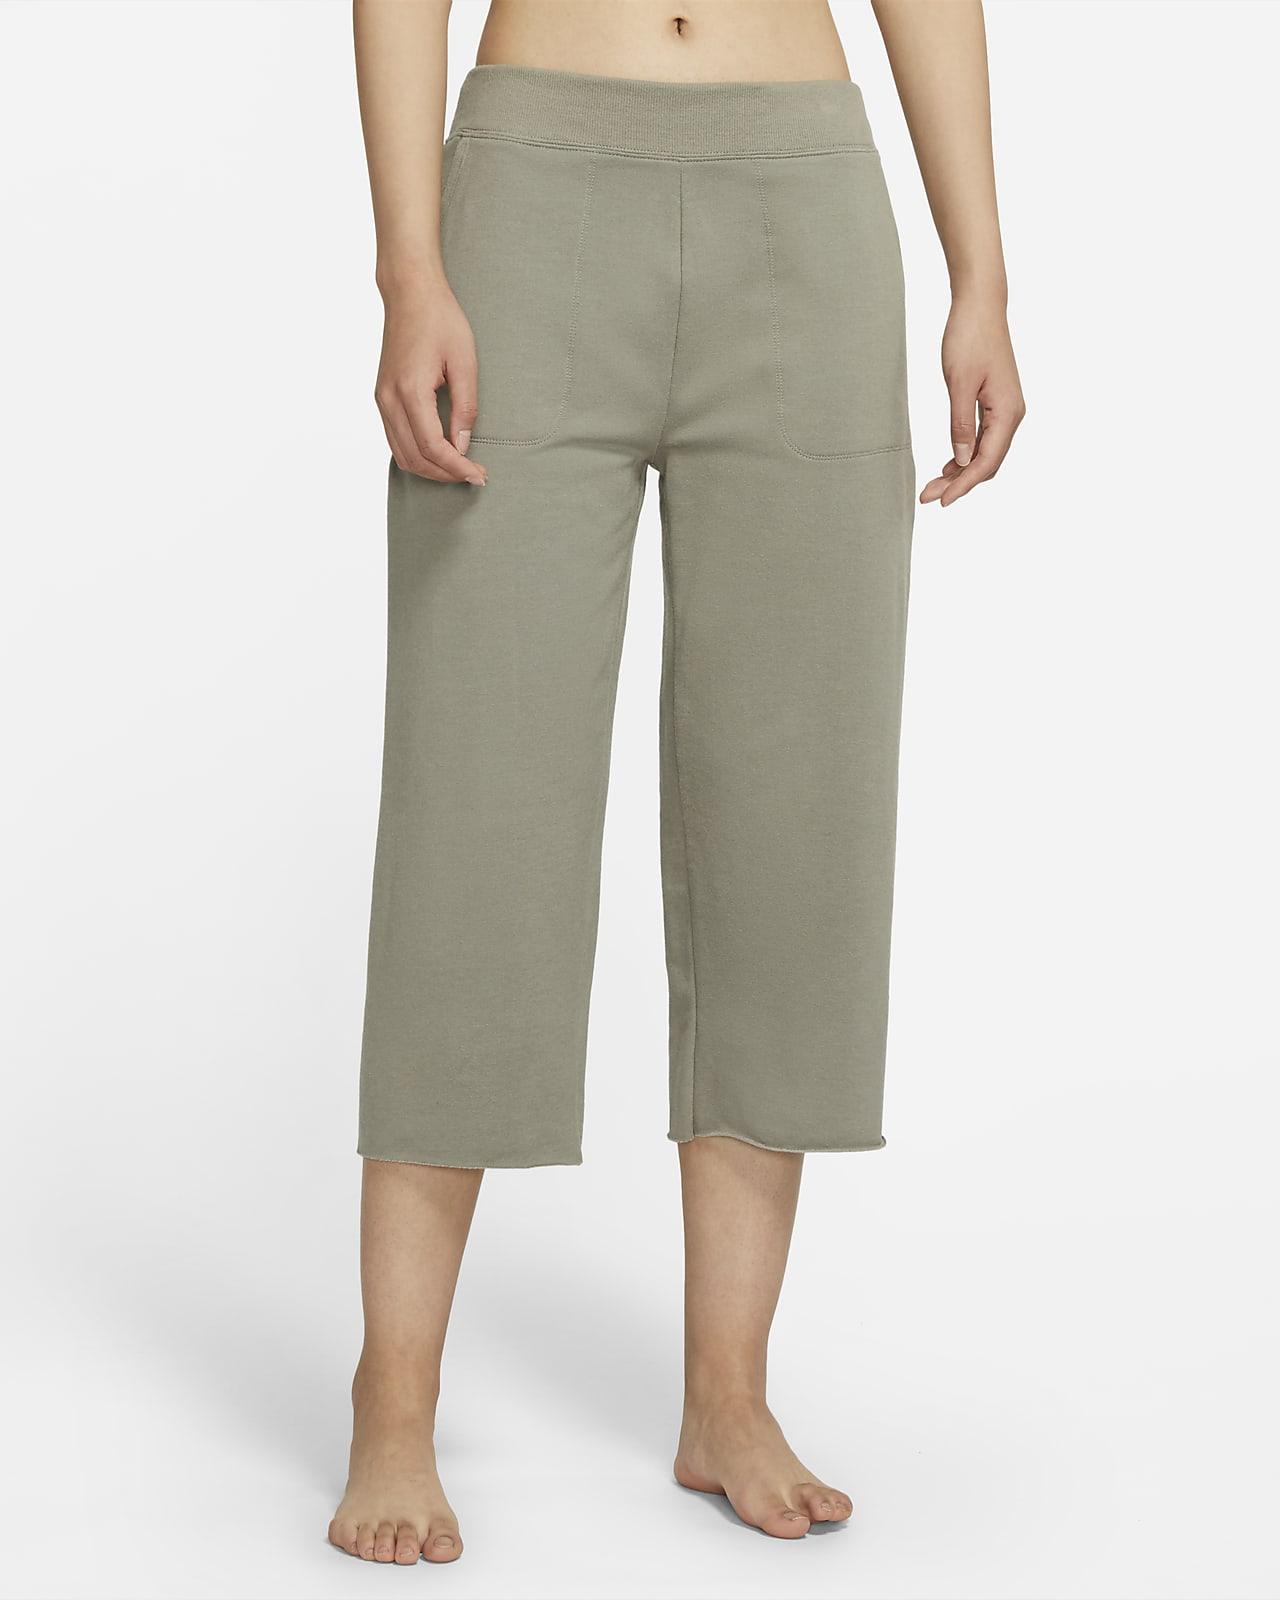 Nike Yoga Luxe 女子起绒中长裤